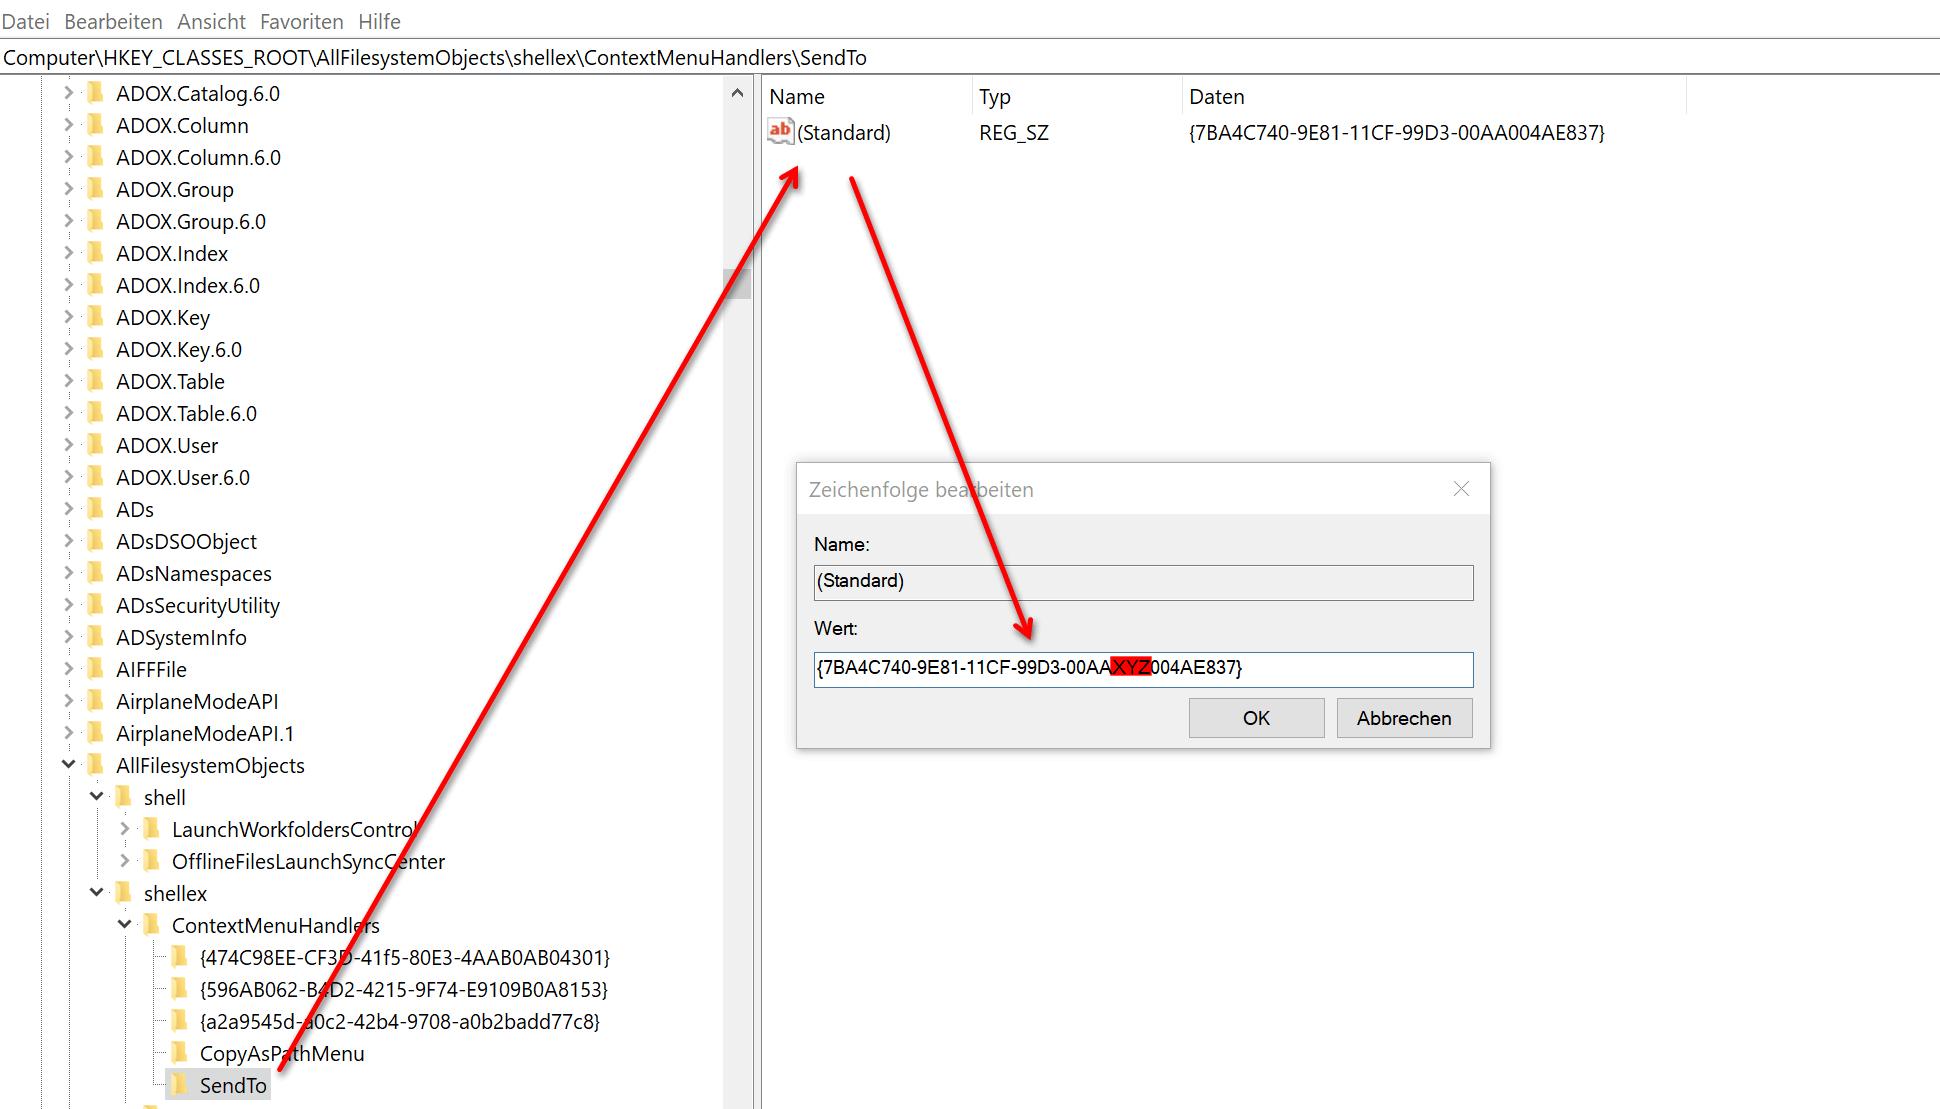 Windows 10 Registry_Kontextmenueeintraege bearbeiten_Schritt2